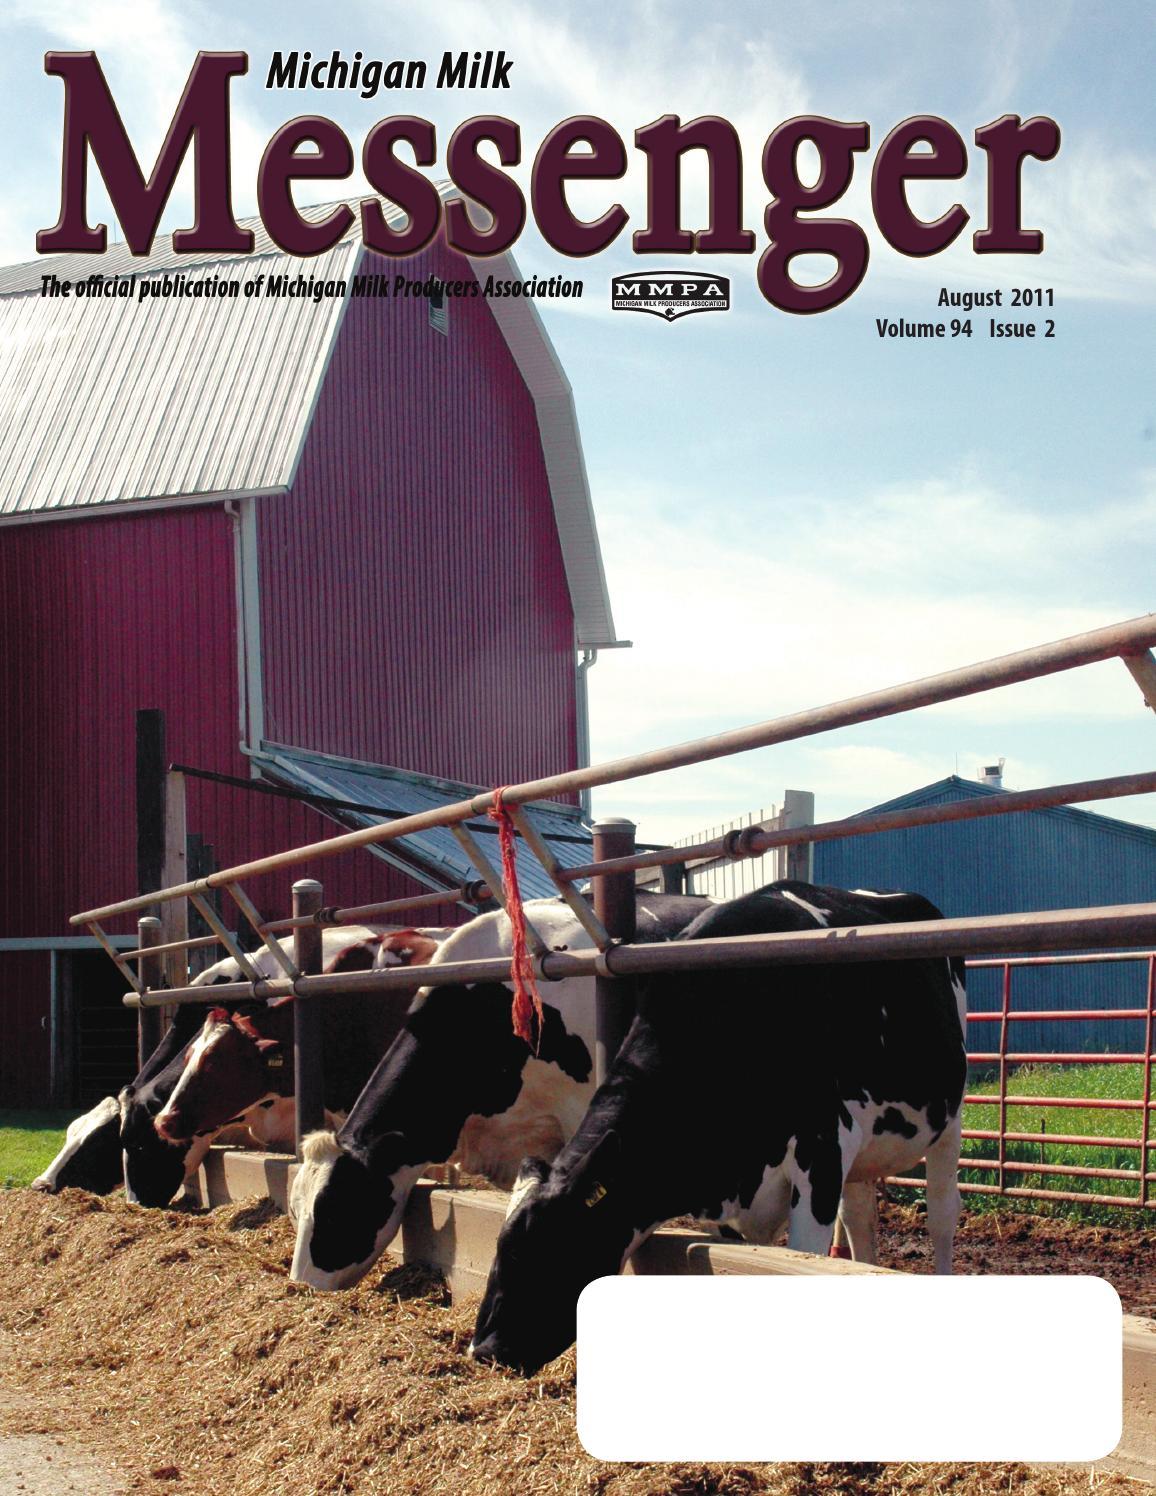 Michigan Milk Messenger: August 2011